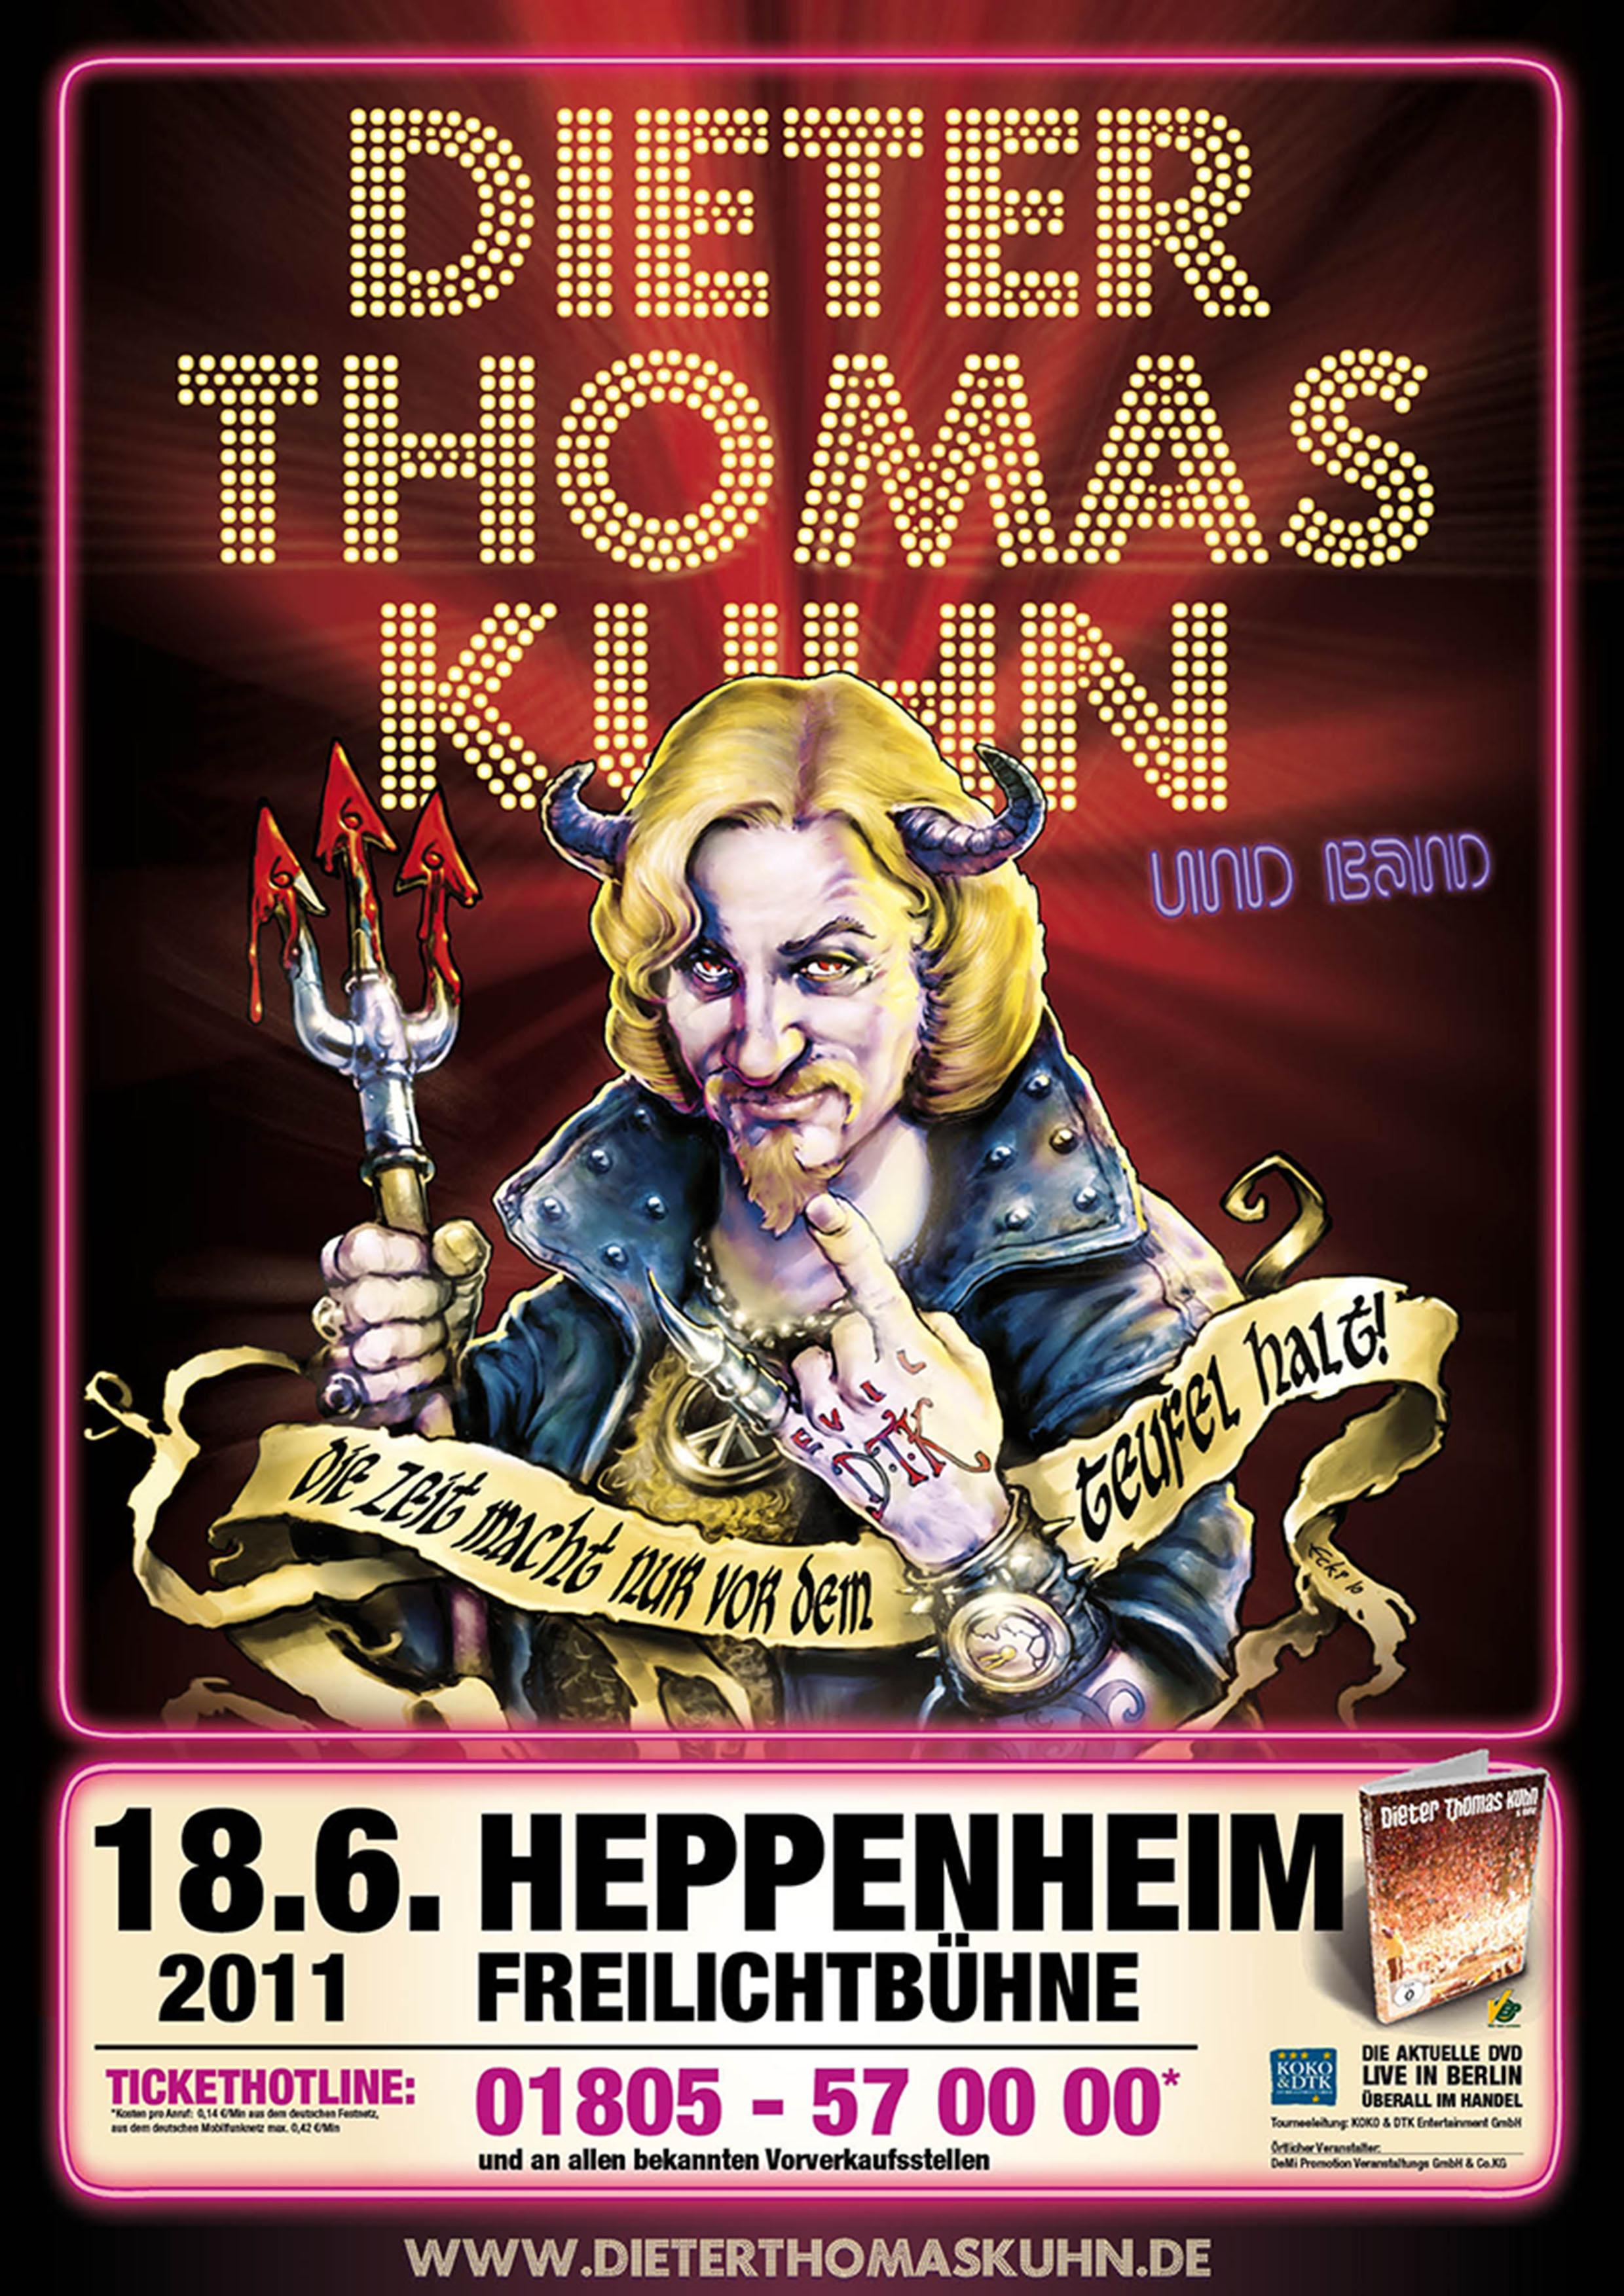 Dieter Thomas Kuhn · Heppenheim